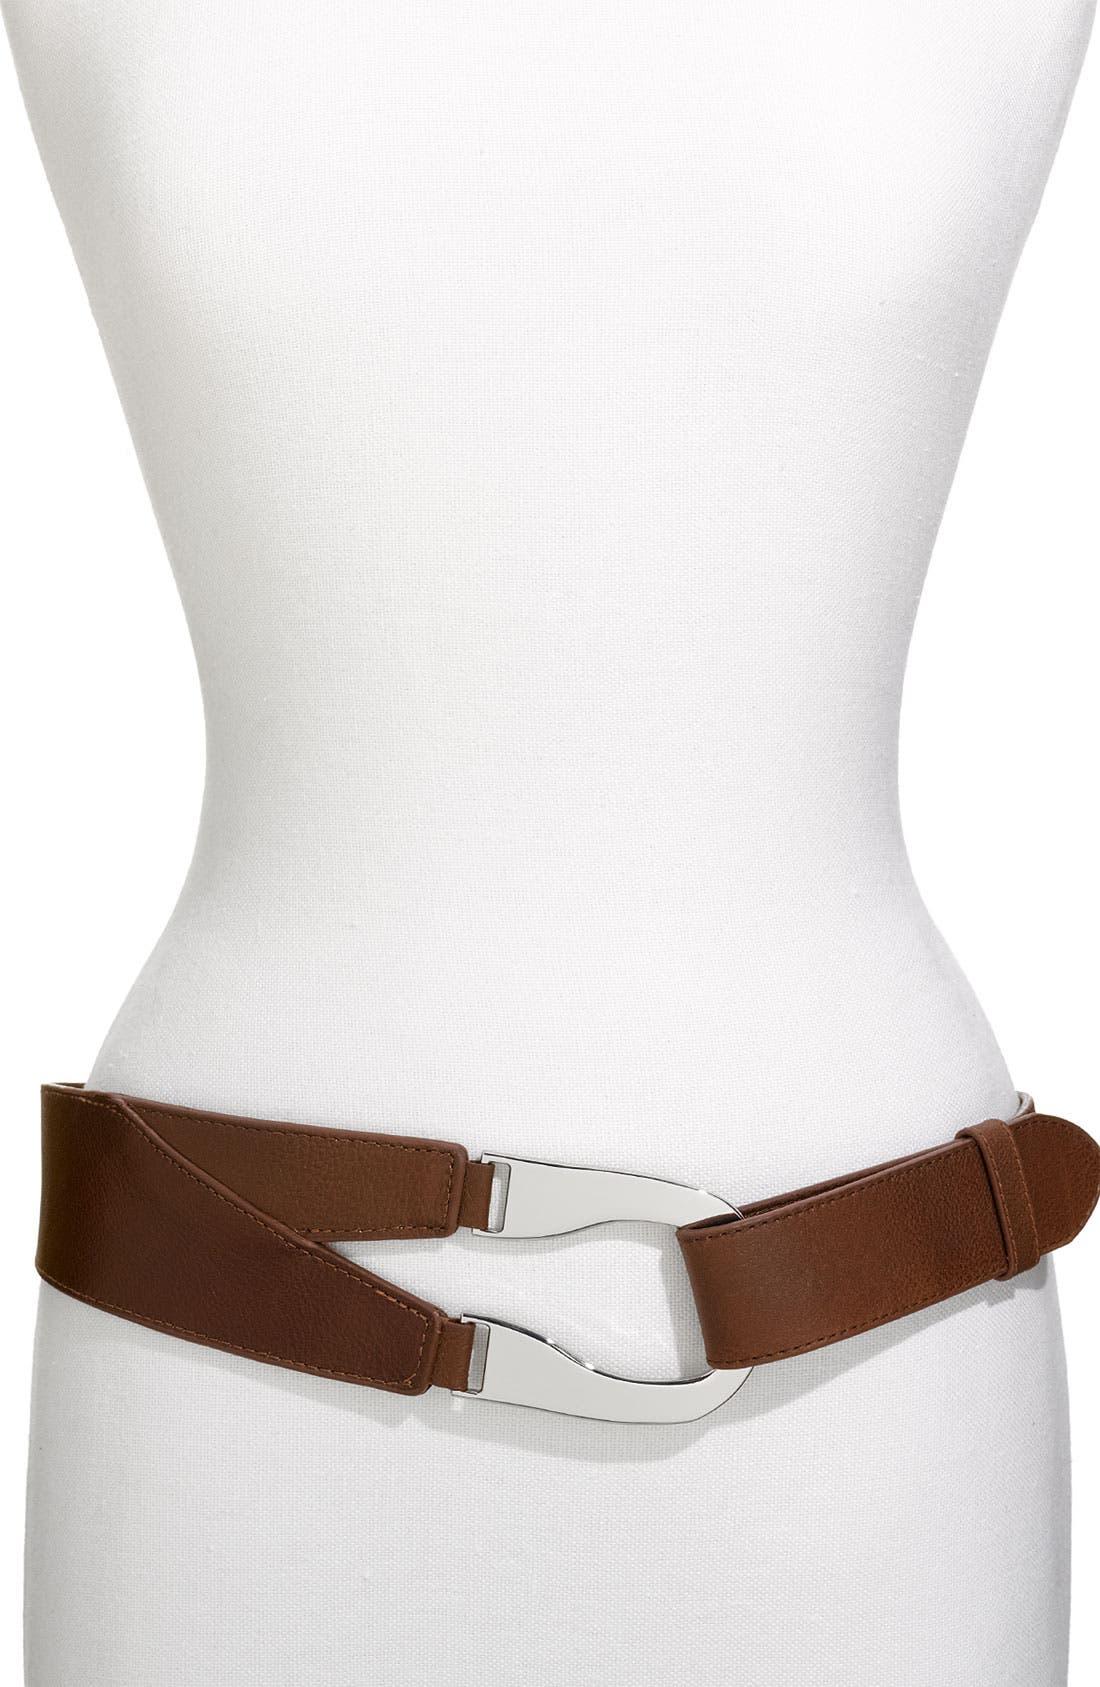 Main Image - Lafayette 148 New York Leather Belt